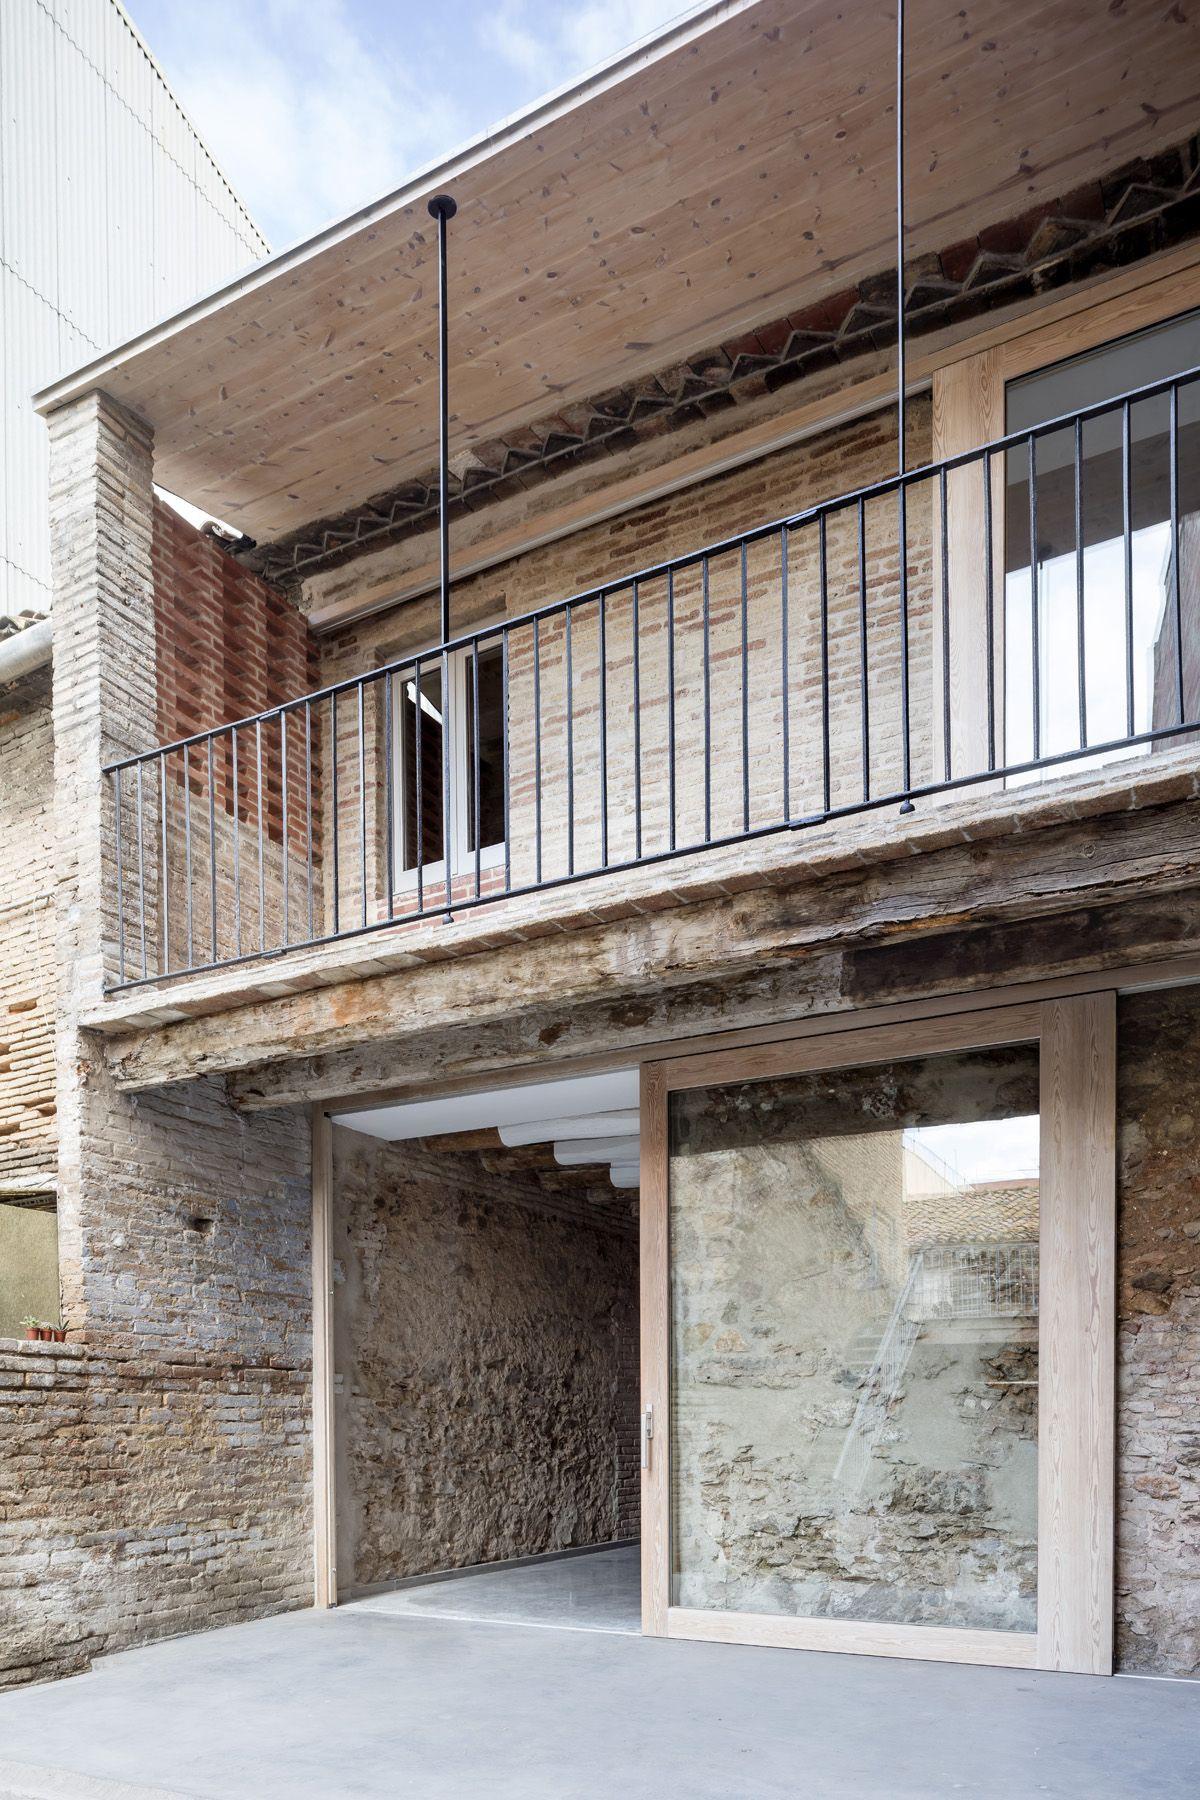 stepienybarno-stepien-y-barno-arquitectura-ProyectoDelDia-Afasia-adria-goula-dataae